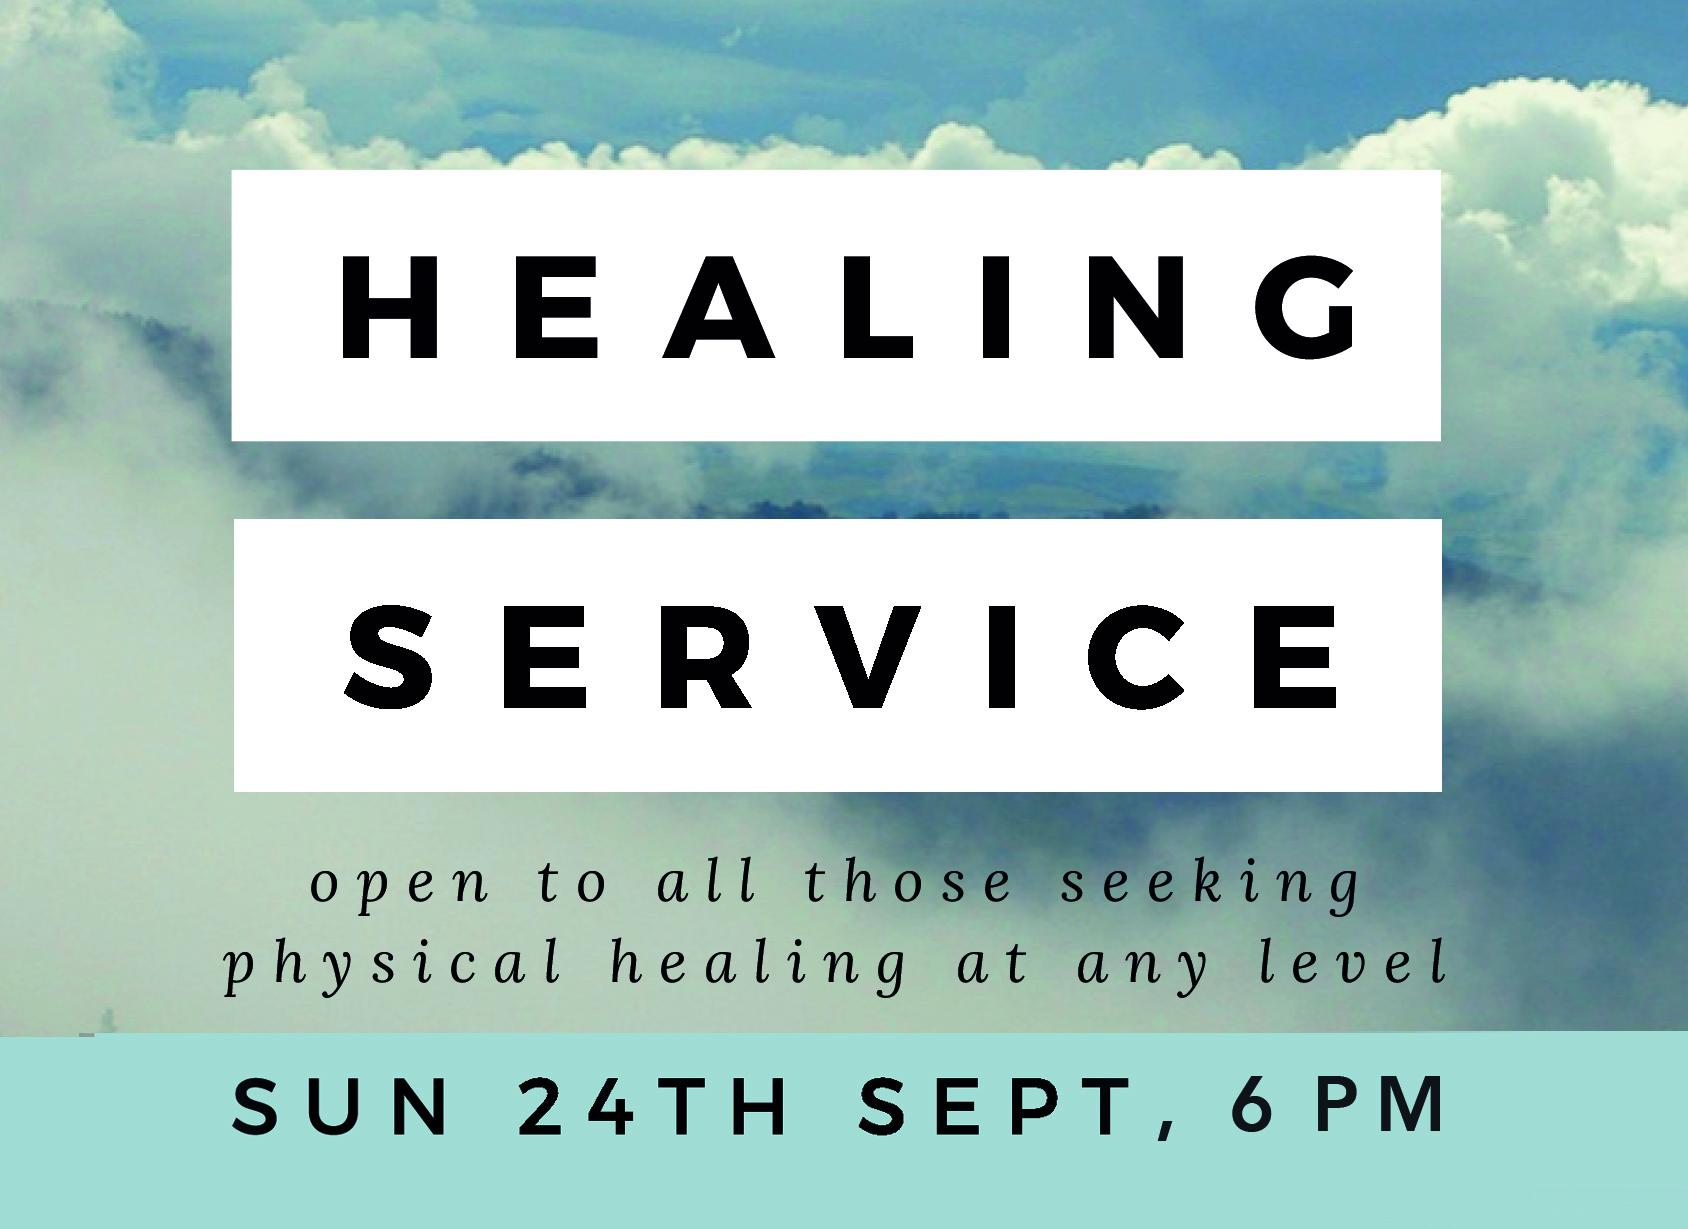 Healing Service - Sun 24th Sept 6pm